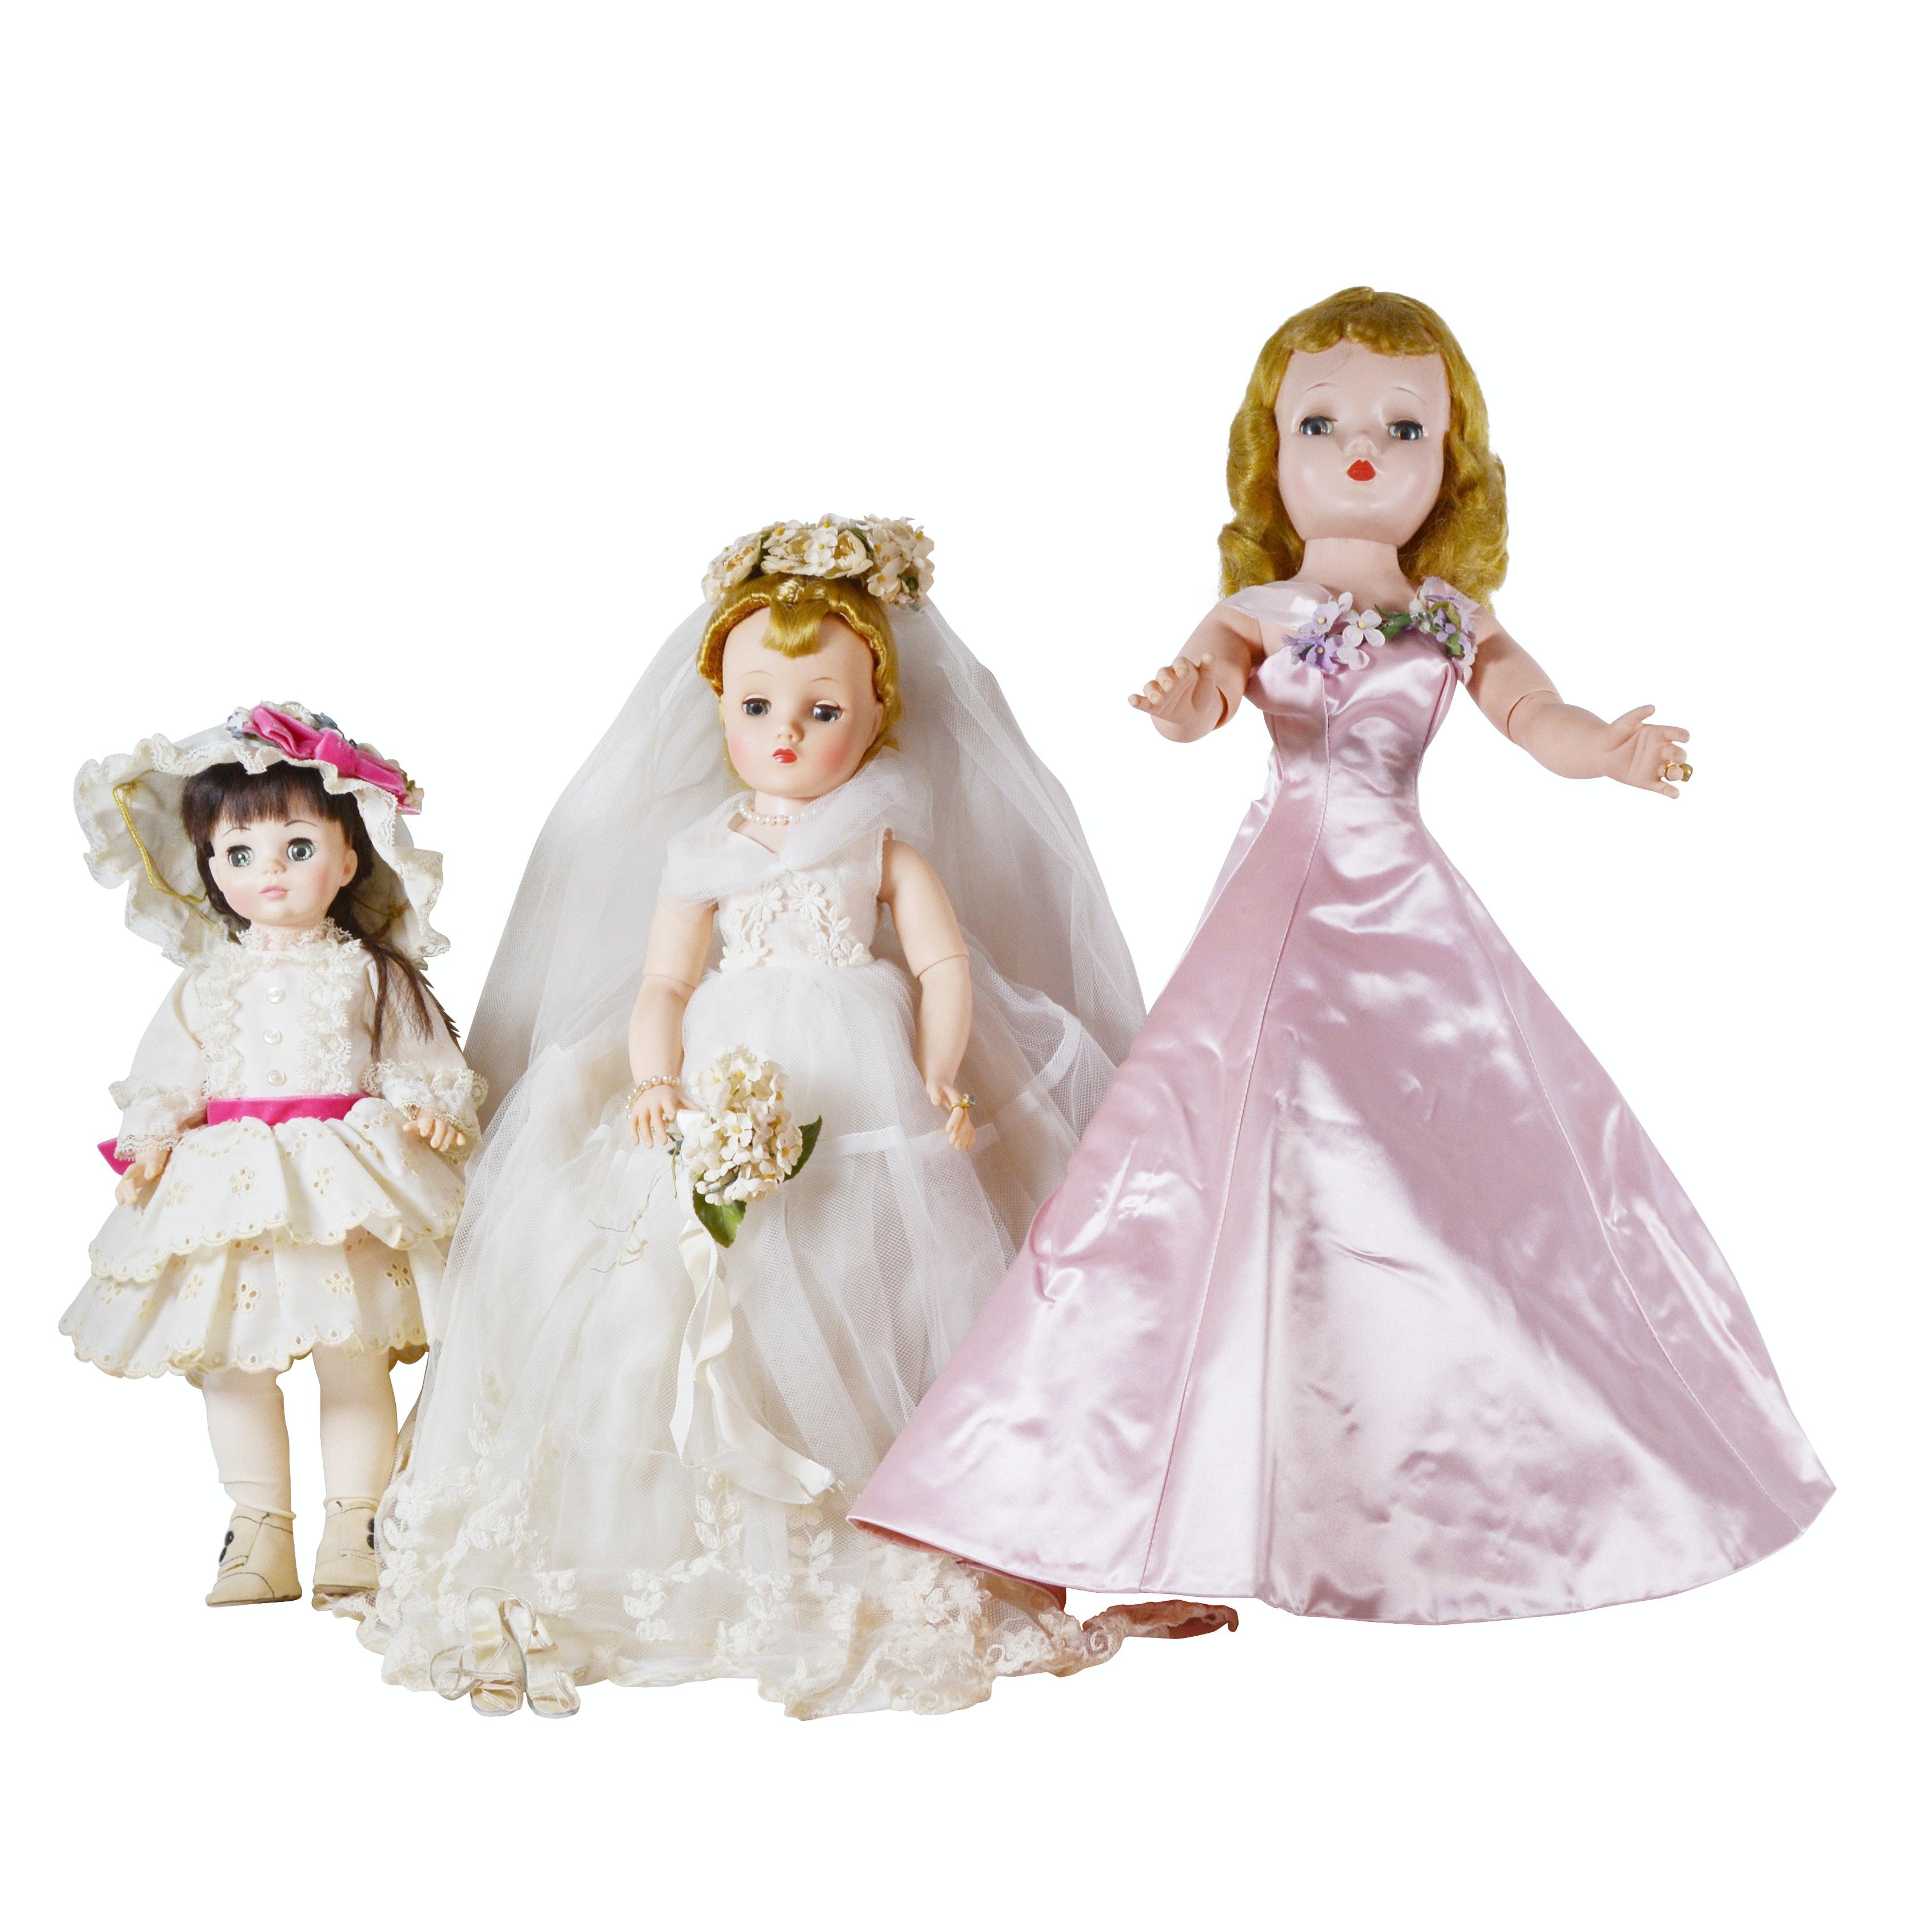 Madam Alexander Dolls and Assorted Clothing